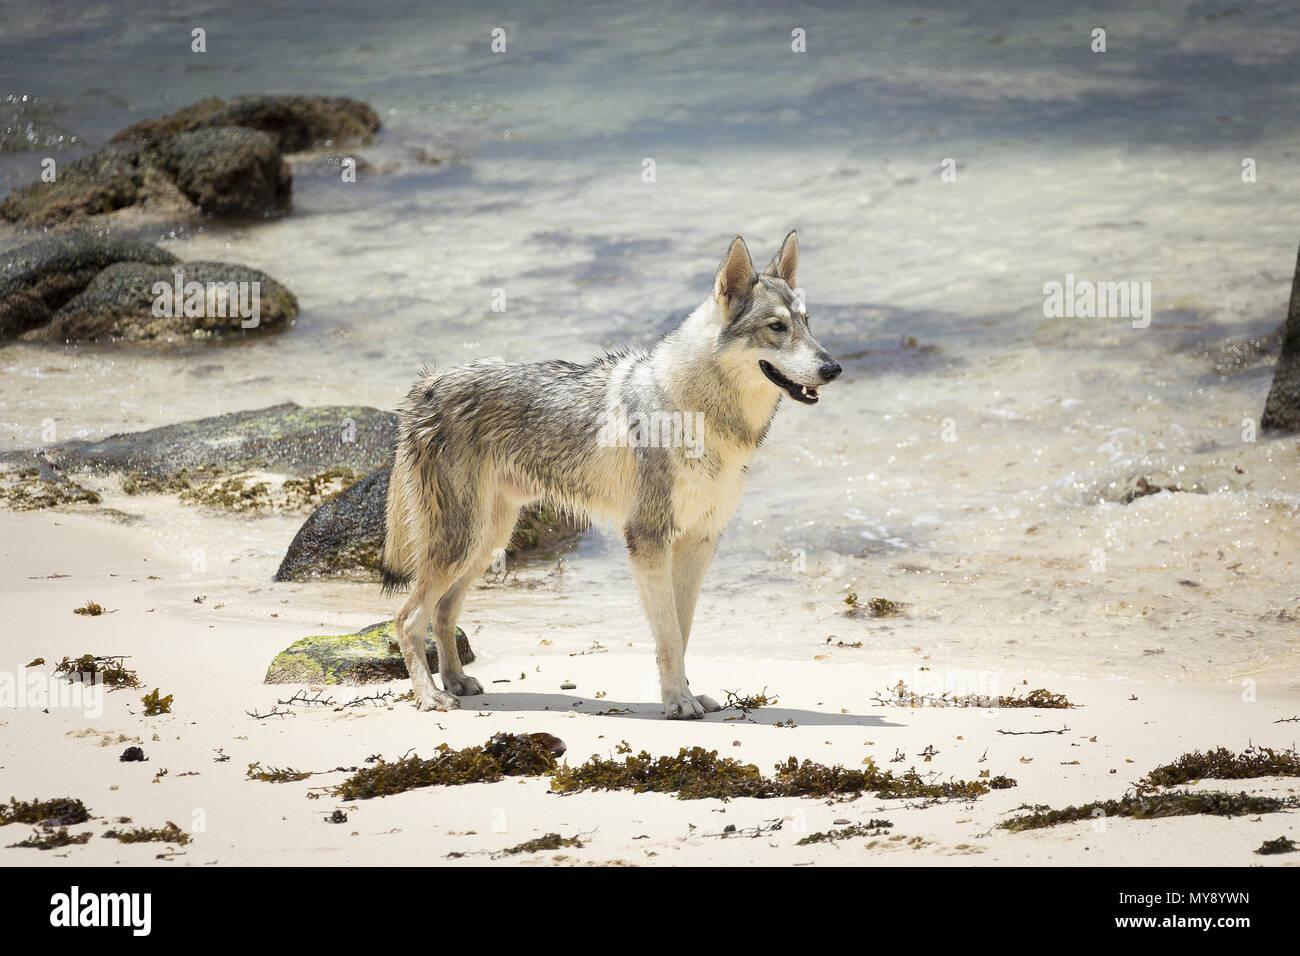 Tamaskan Dog. Adult dog standing on a beach. Seychelles - Stock Image